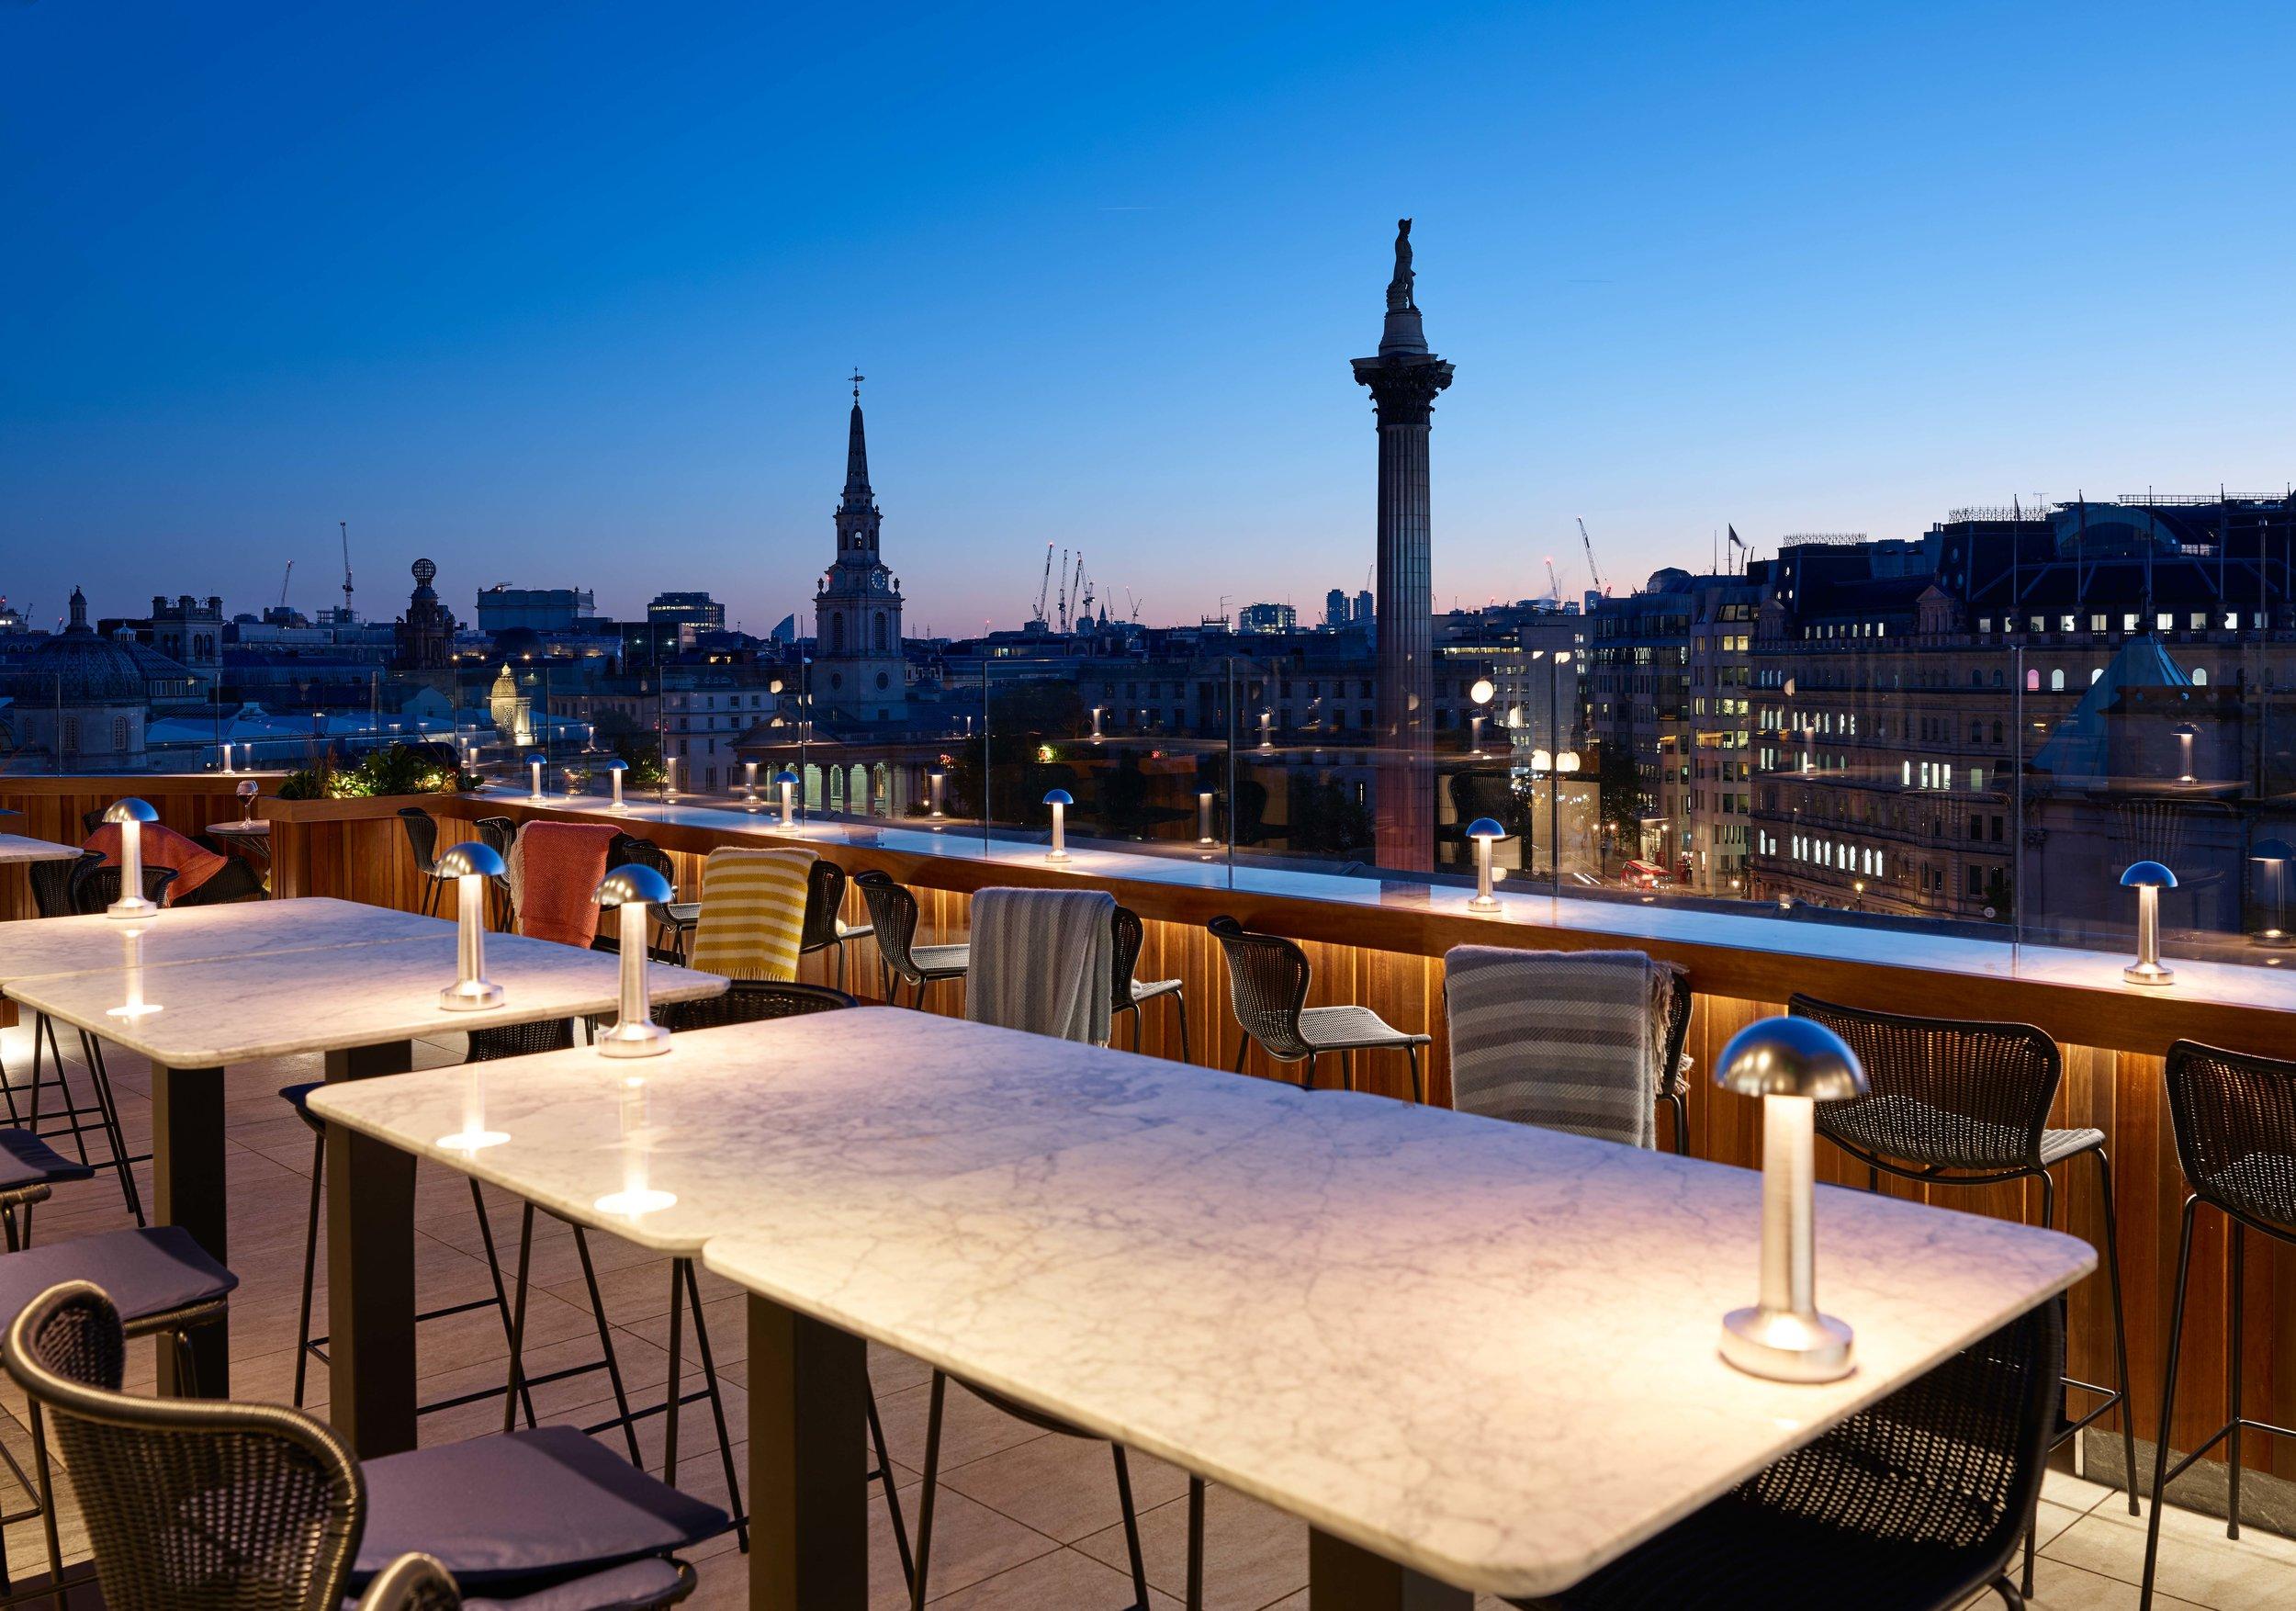 The rooftop bar at Trafalgar Dining Rooms